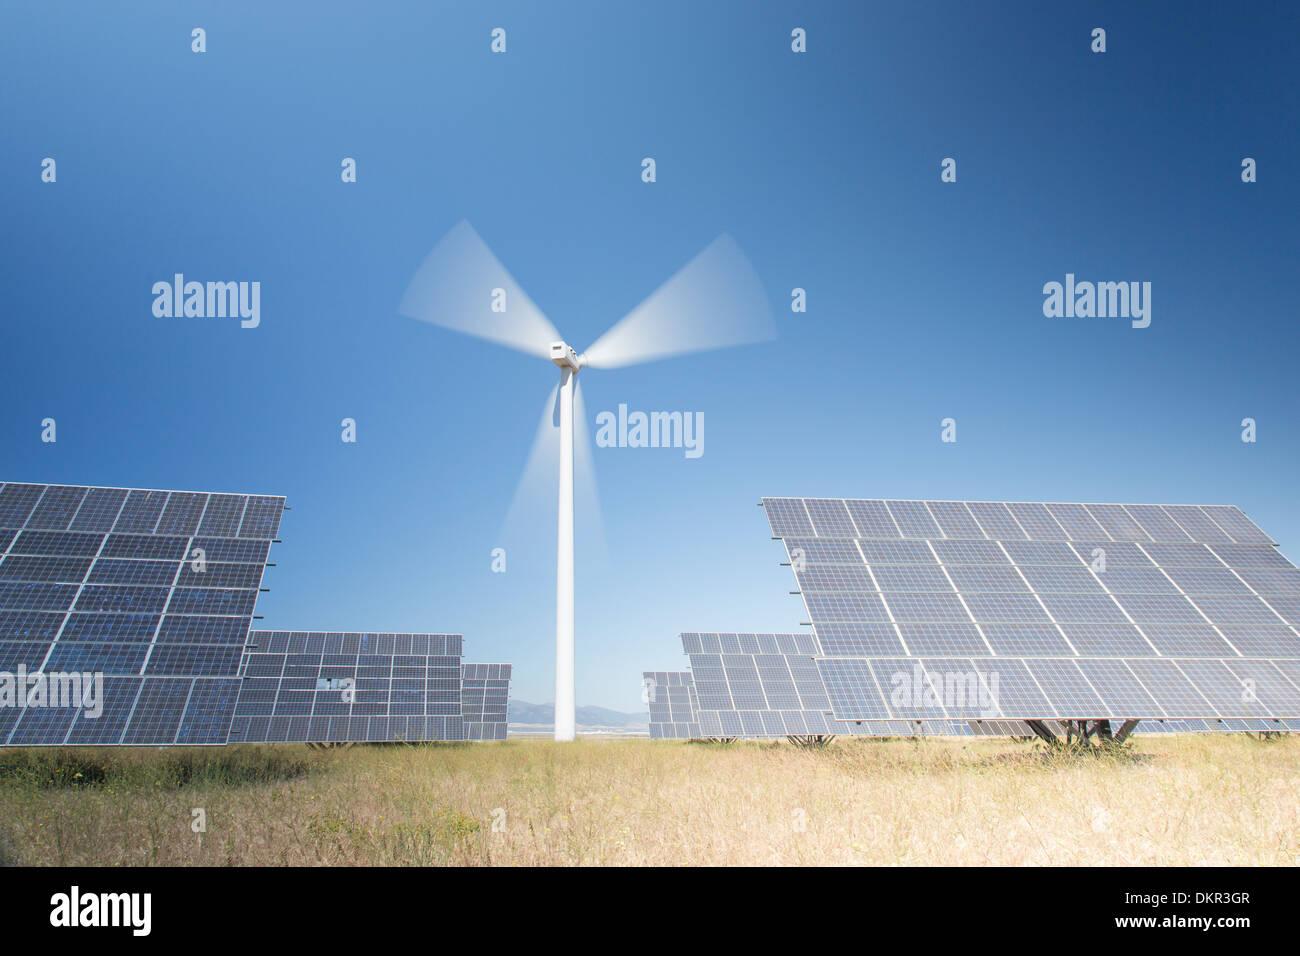 Solar panels in rural landscape - Stock Image